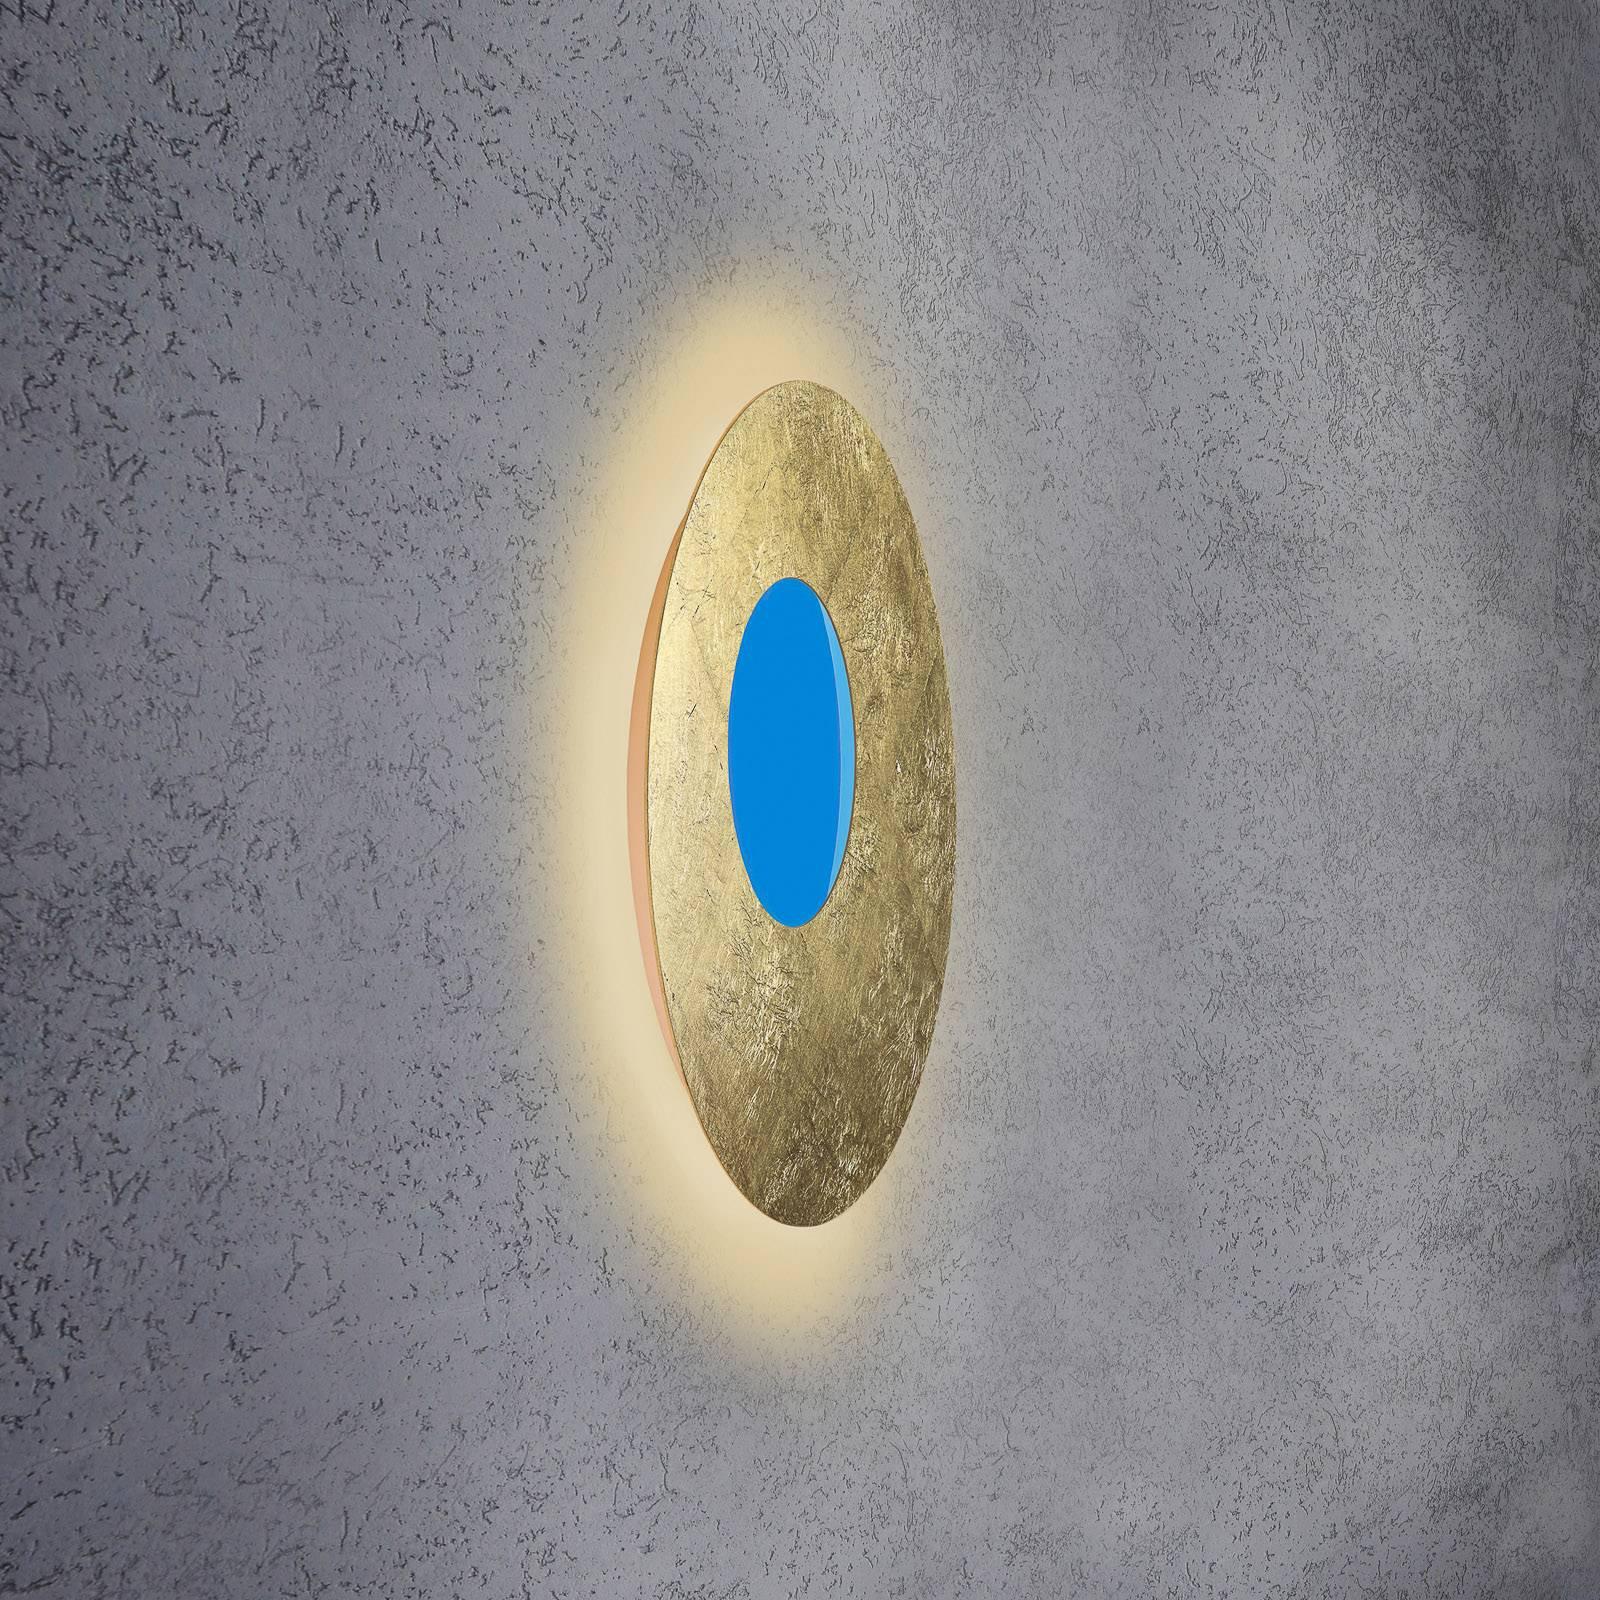 Escale Blade Open LED-vegglampe RGB+W, gull, Ø59cm